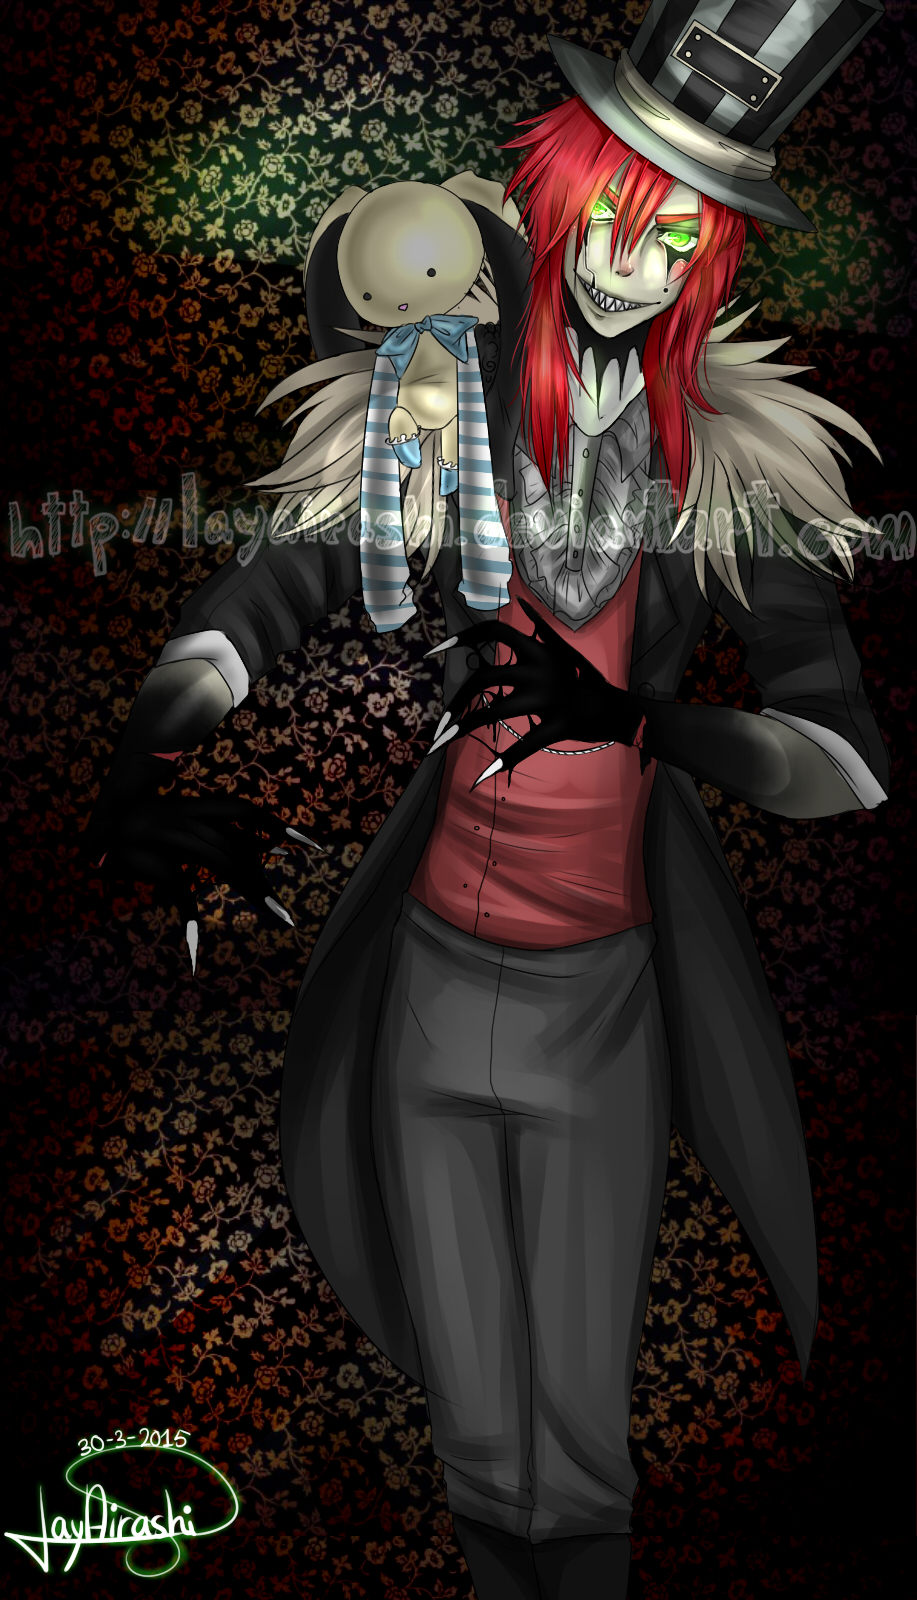 Jason The Toy Maker By Layairashi On Deviantart